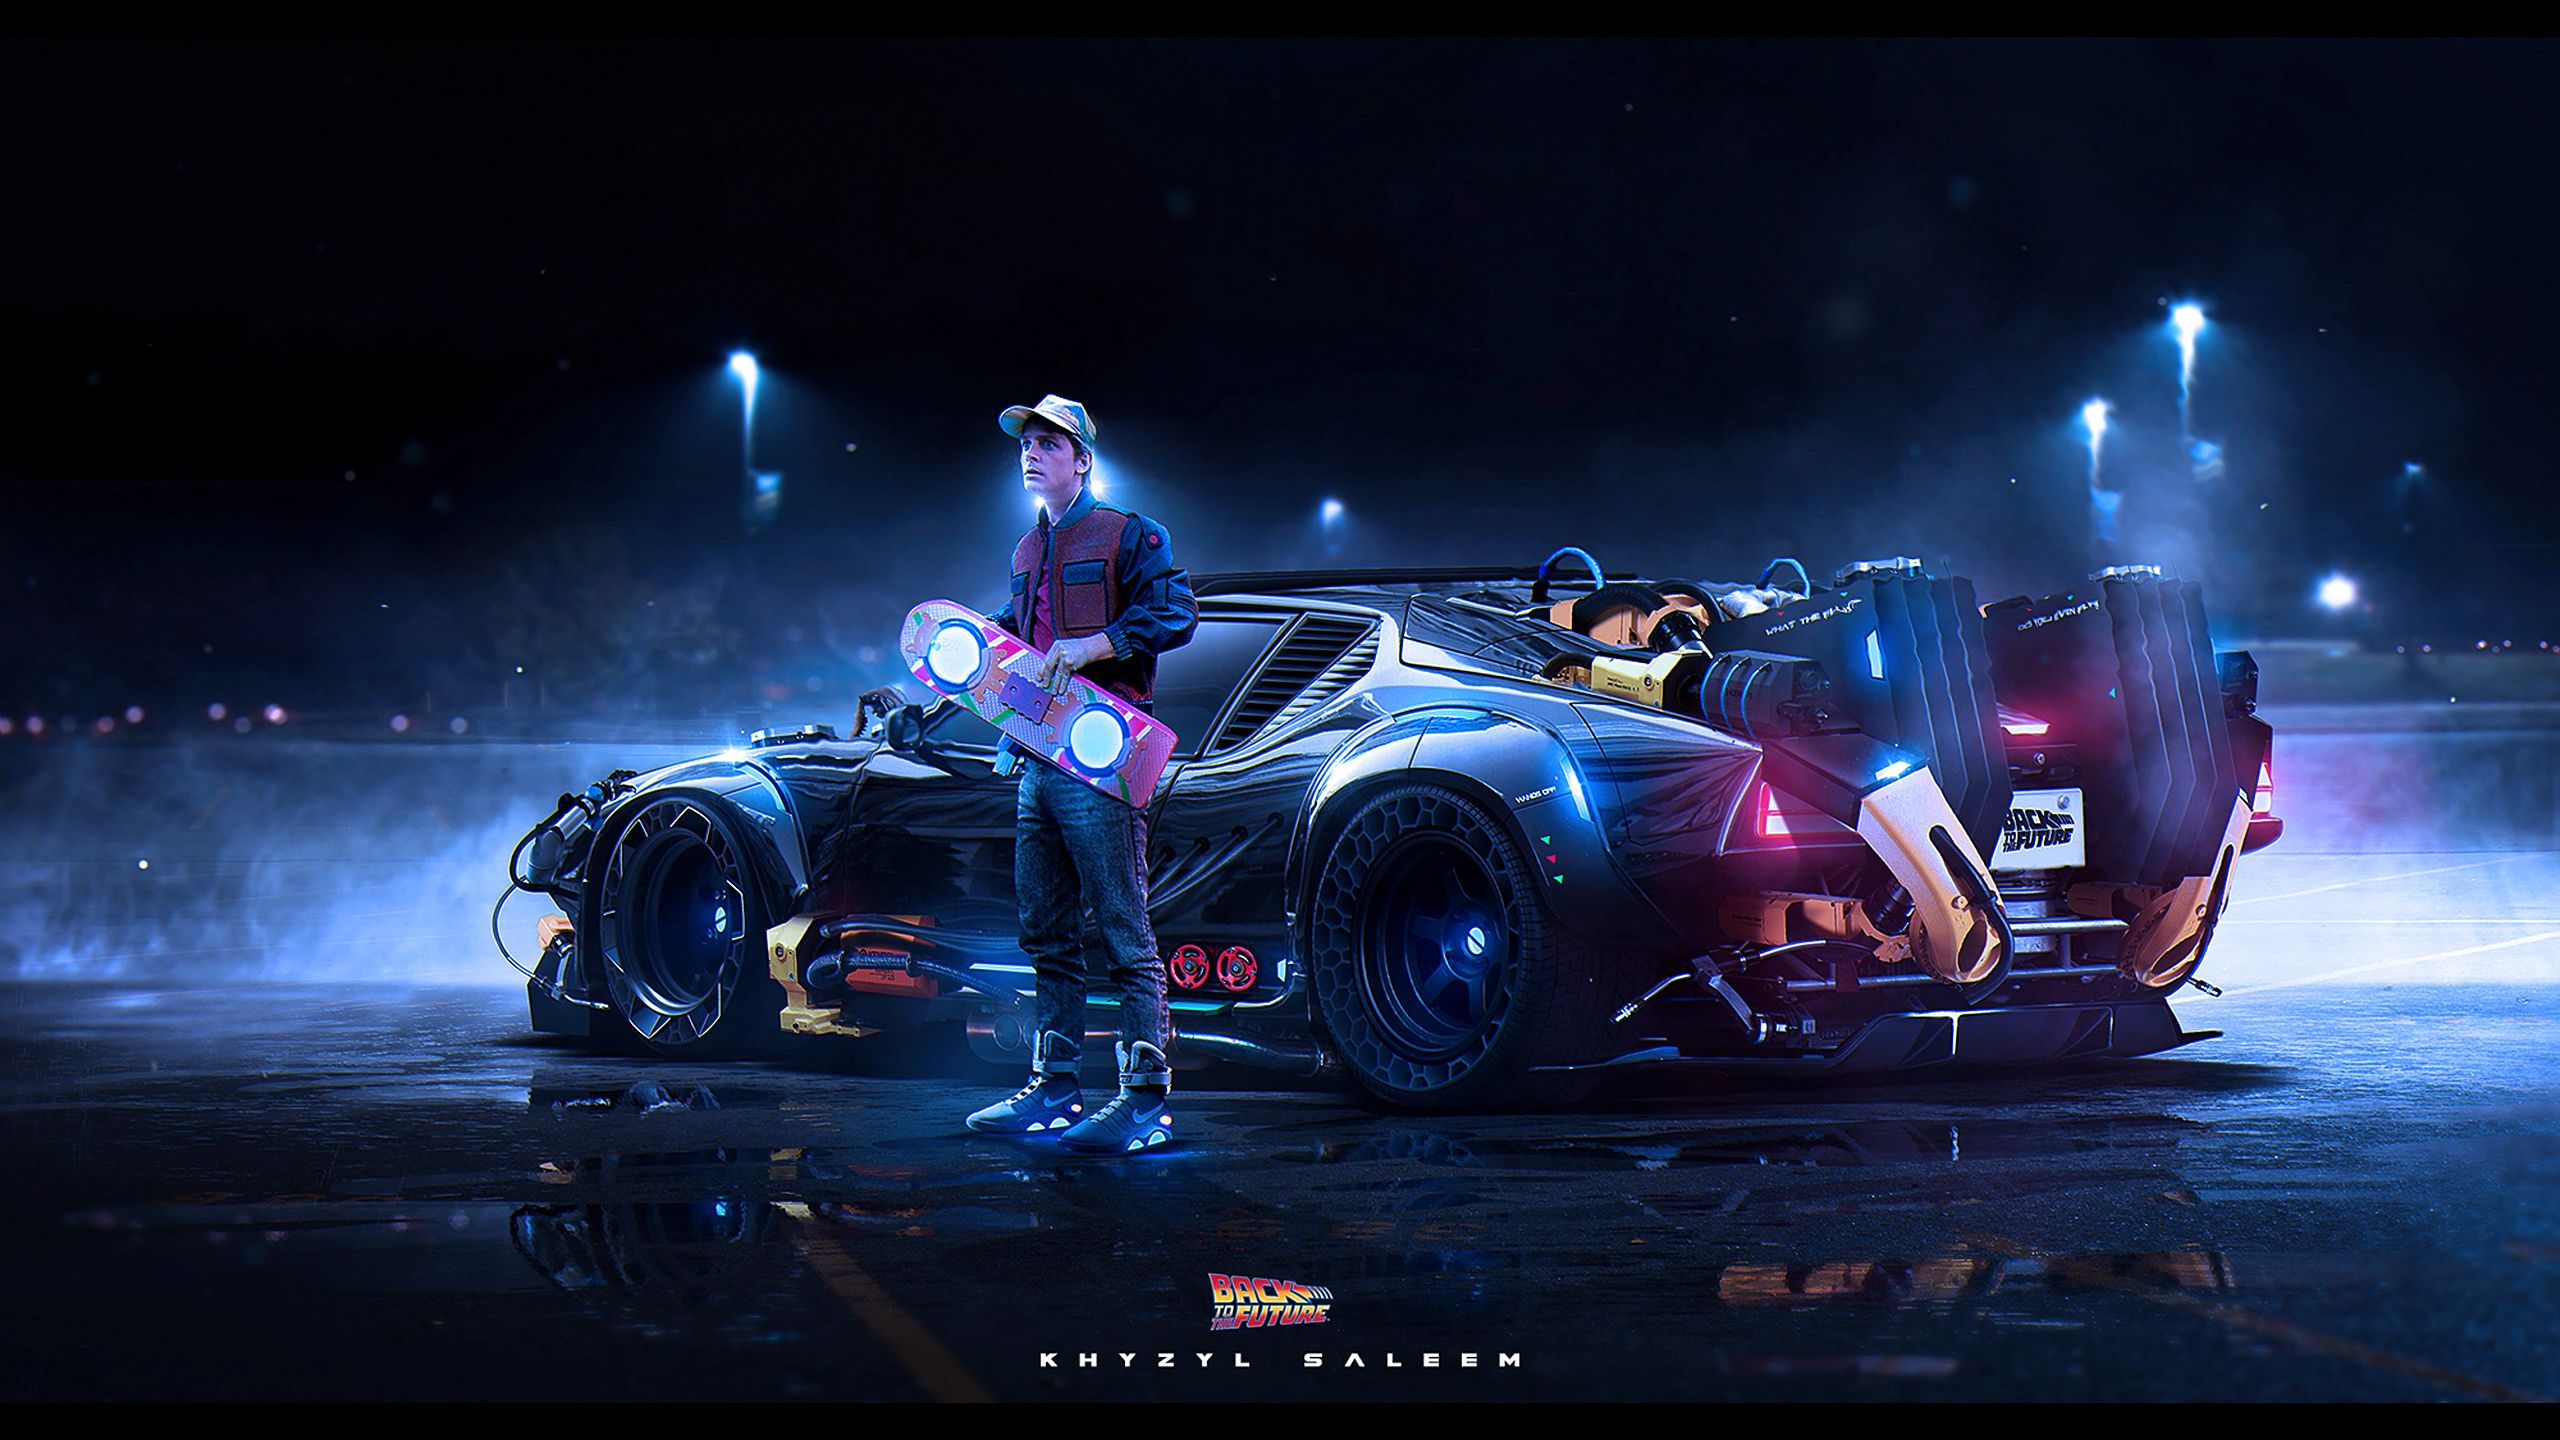 Back to the Future artwork by Khyzyl Saleem